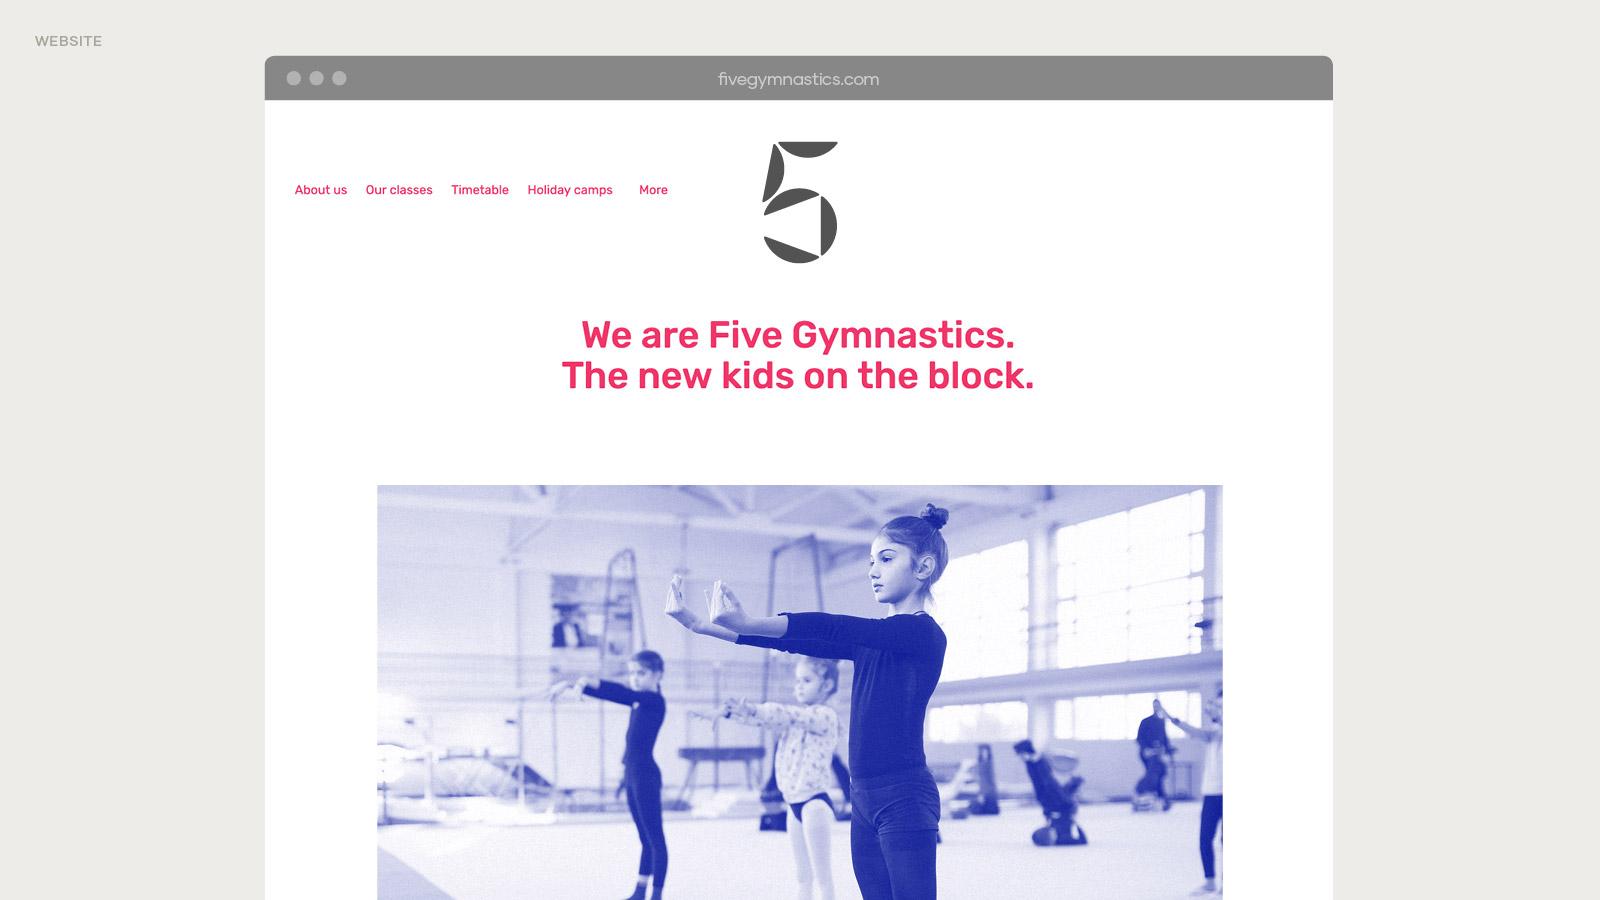 identity-design-logo-gym-gymnastics-british-five-typography-branding-milton-keynes-28